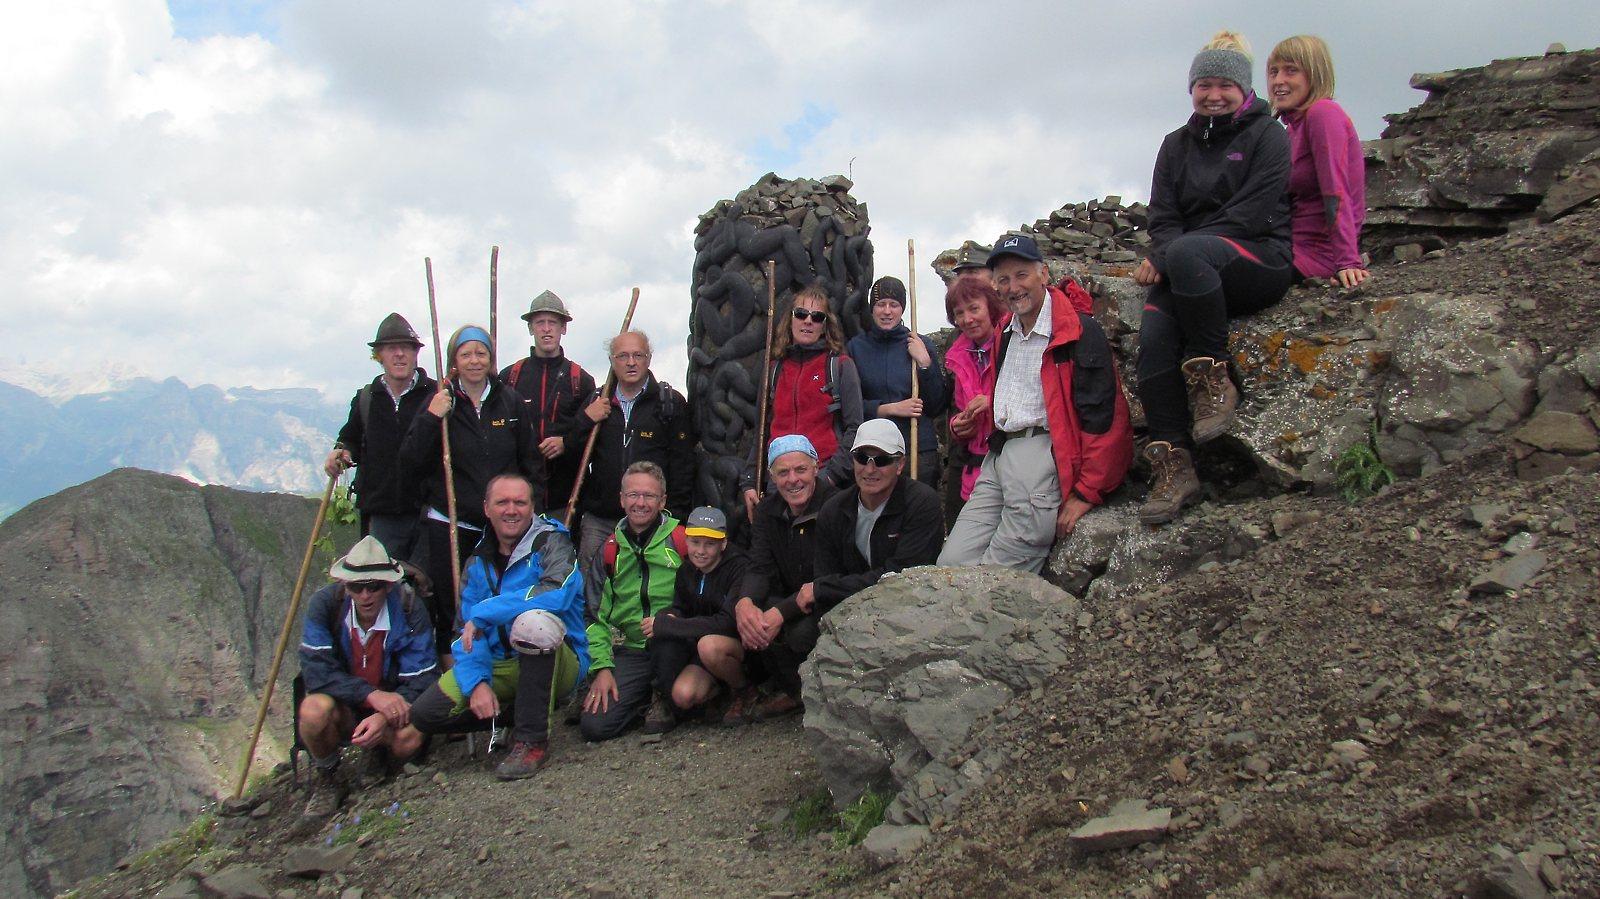 Gipfel Col di Lana